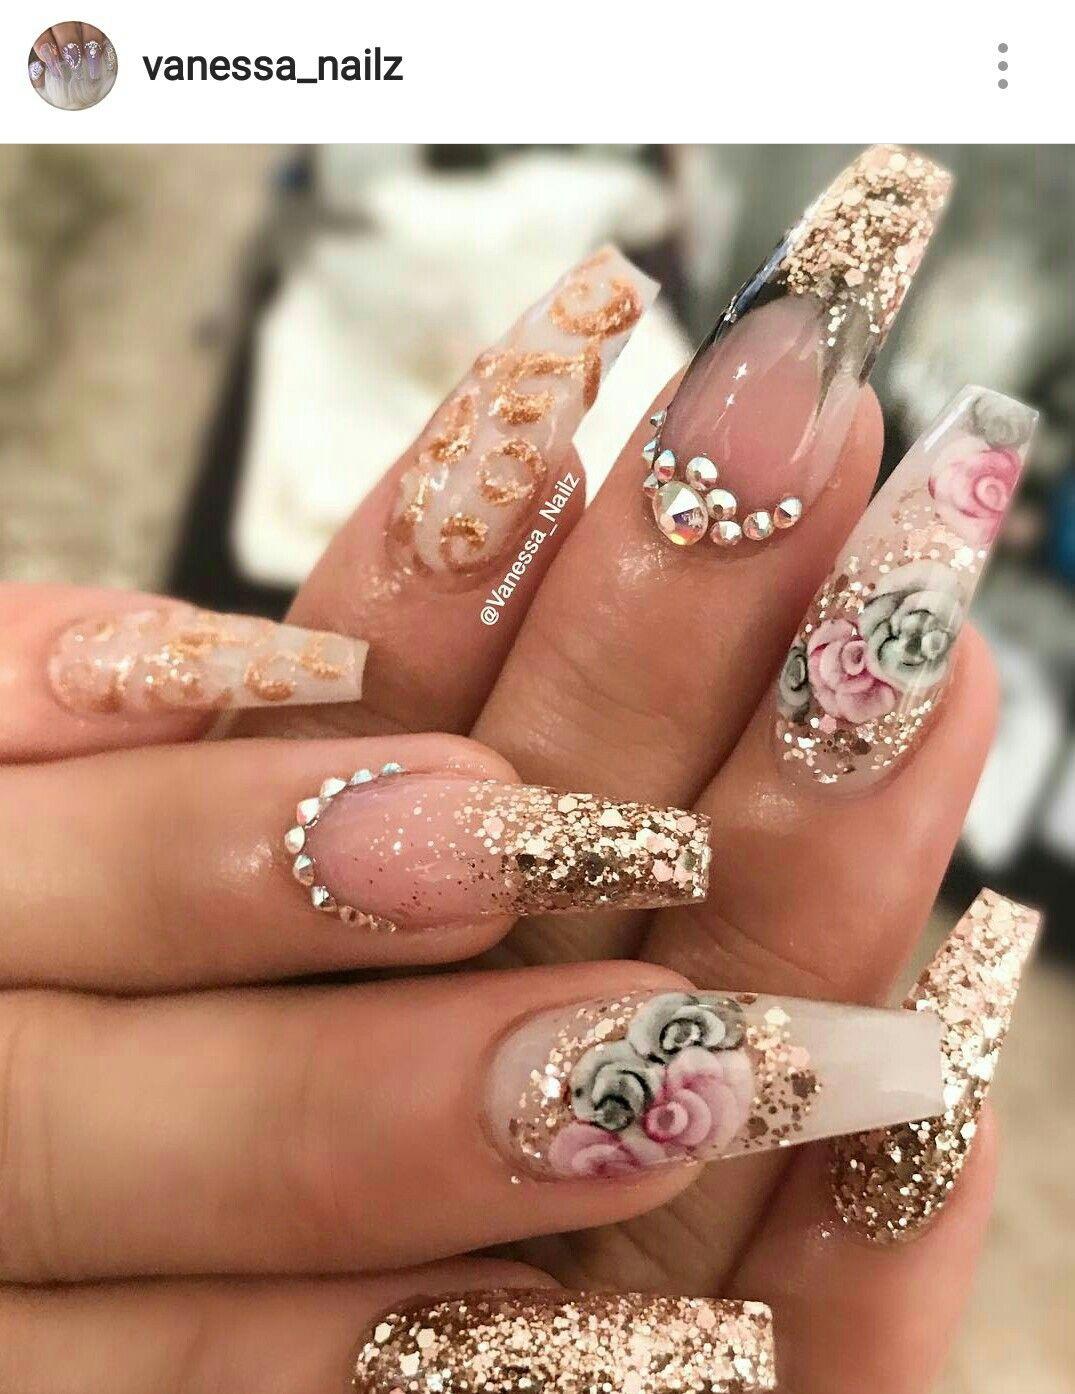 Uñas decoradas | Make Up & Nails | Pinterest | Uña decoradas ...